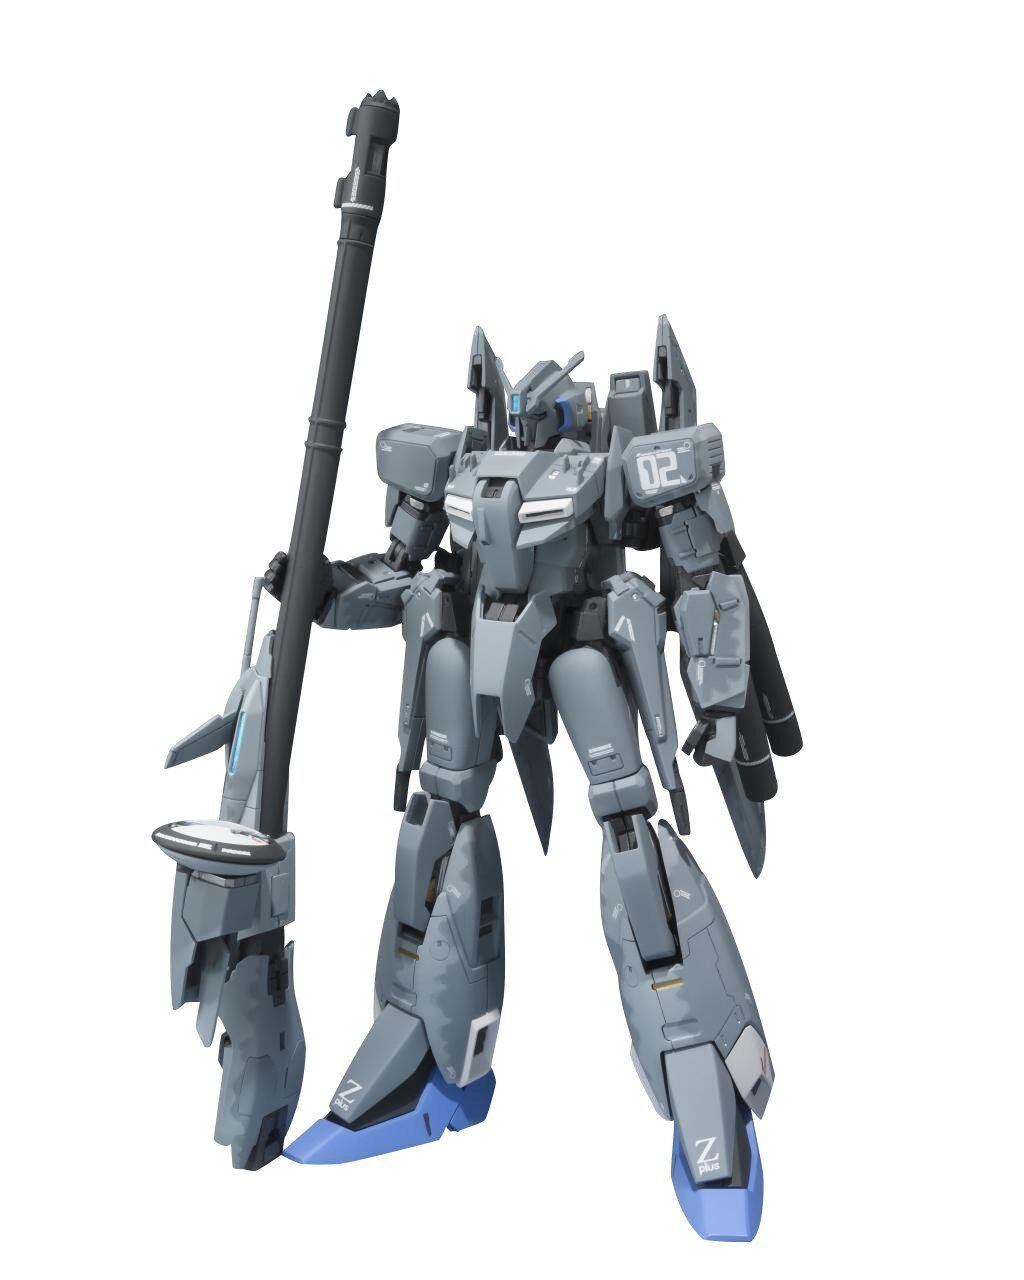 Bandai Gundam Sentinel Metal Robot Spirits Ka firma lado Mississippi Zeta Plus C1 EMS